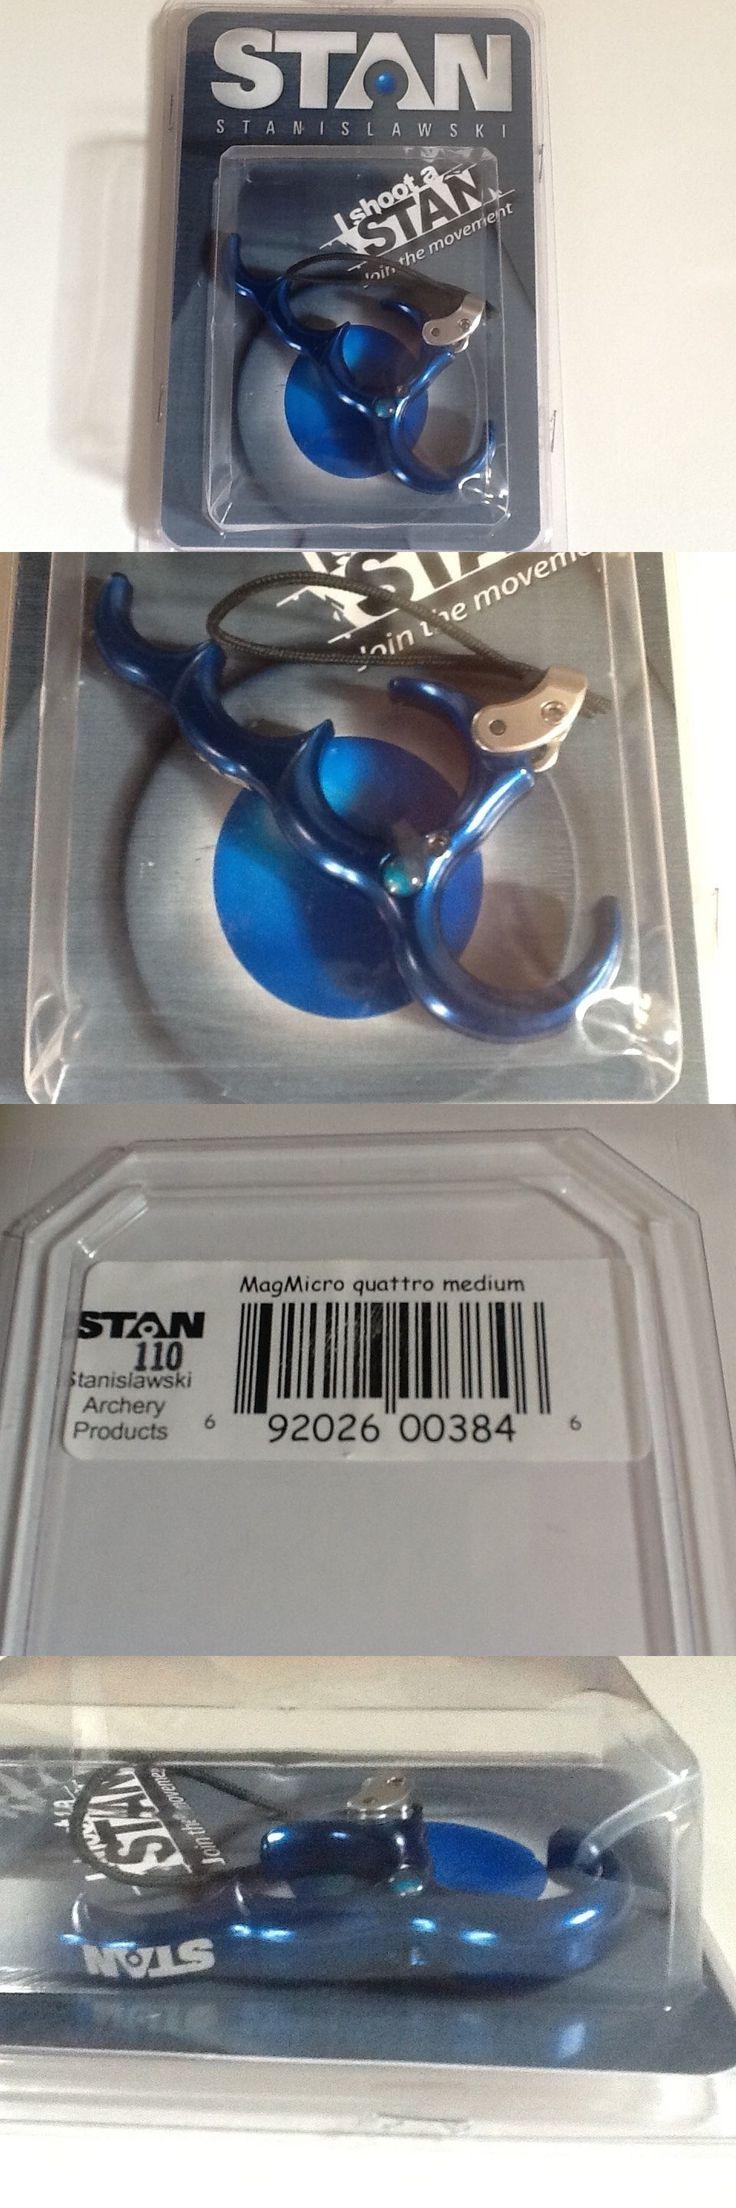 Release Aids 181303: Stanislawski - Stan Mag Micro Quattro - Archery Release - New - Target Archery -> BUY IT NOW ONLY: $99.99 on eBay!